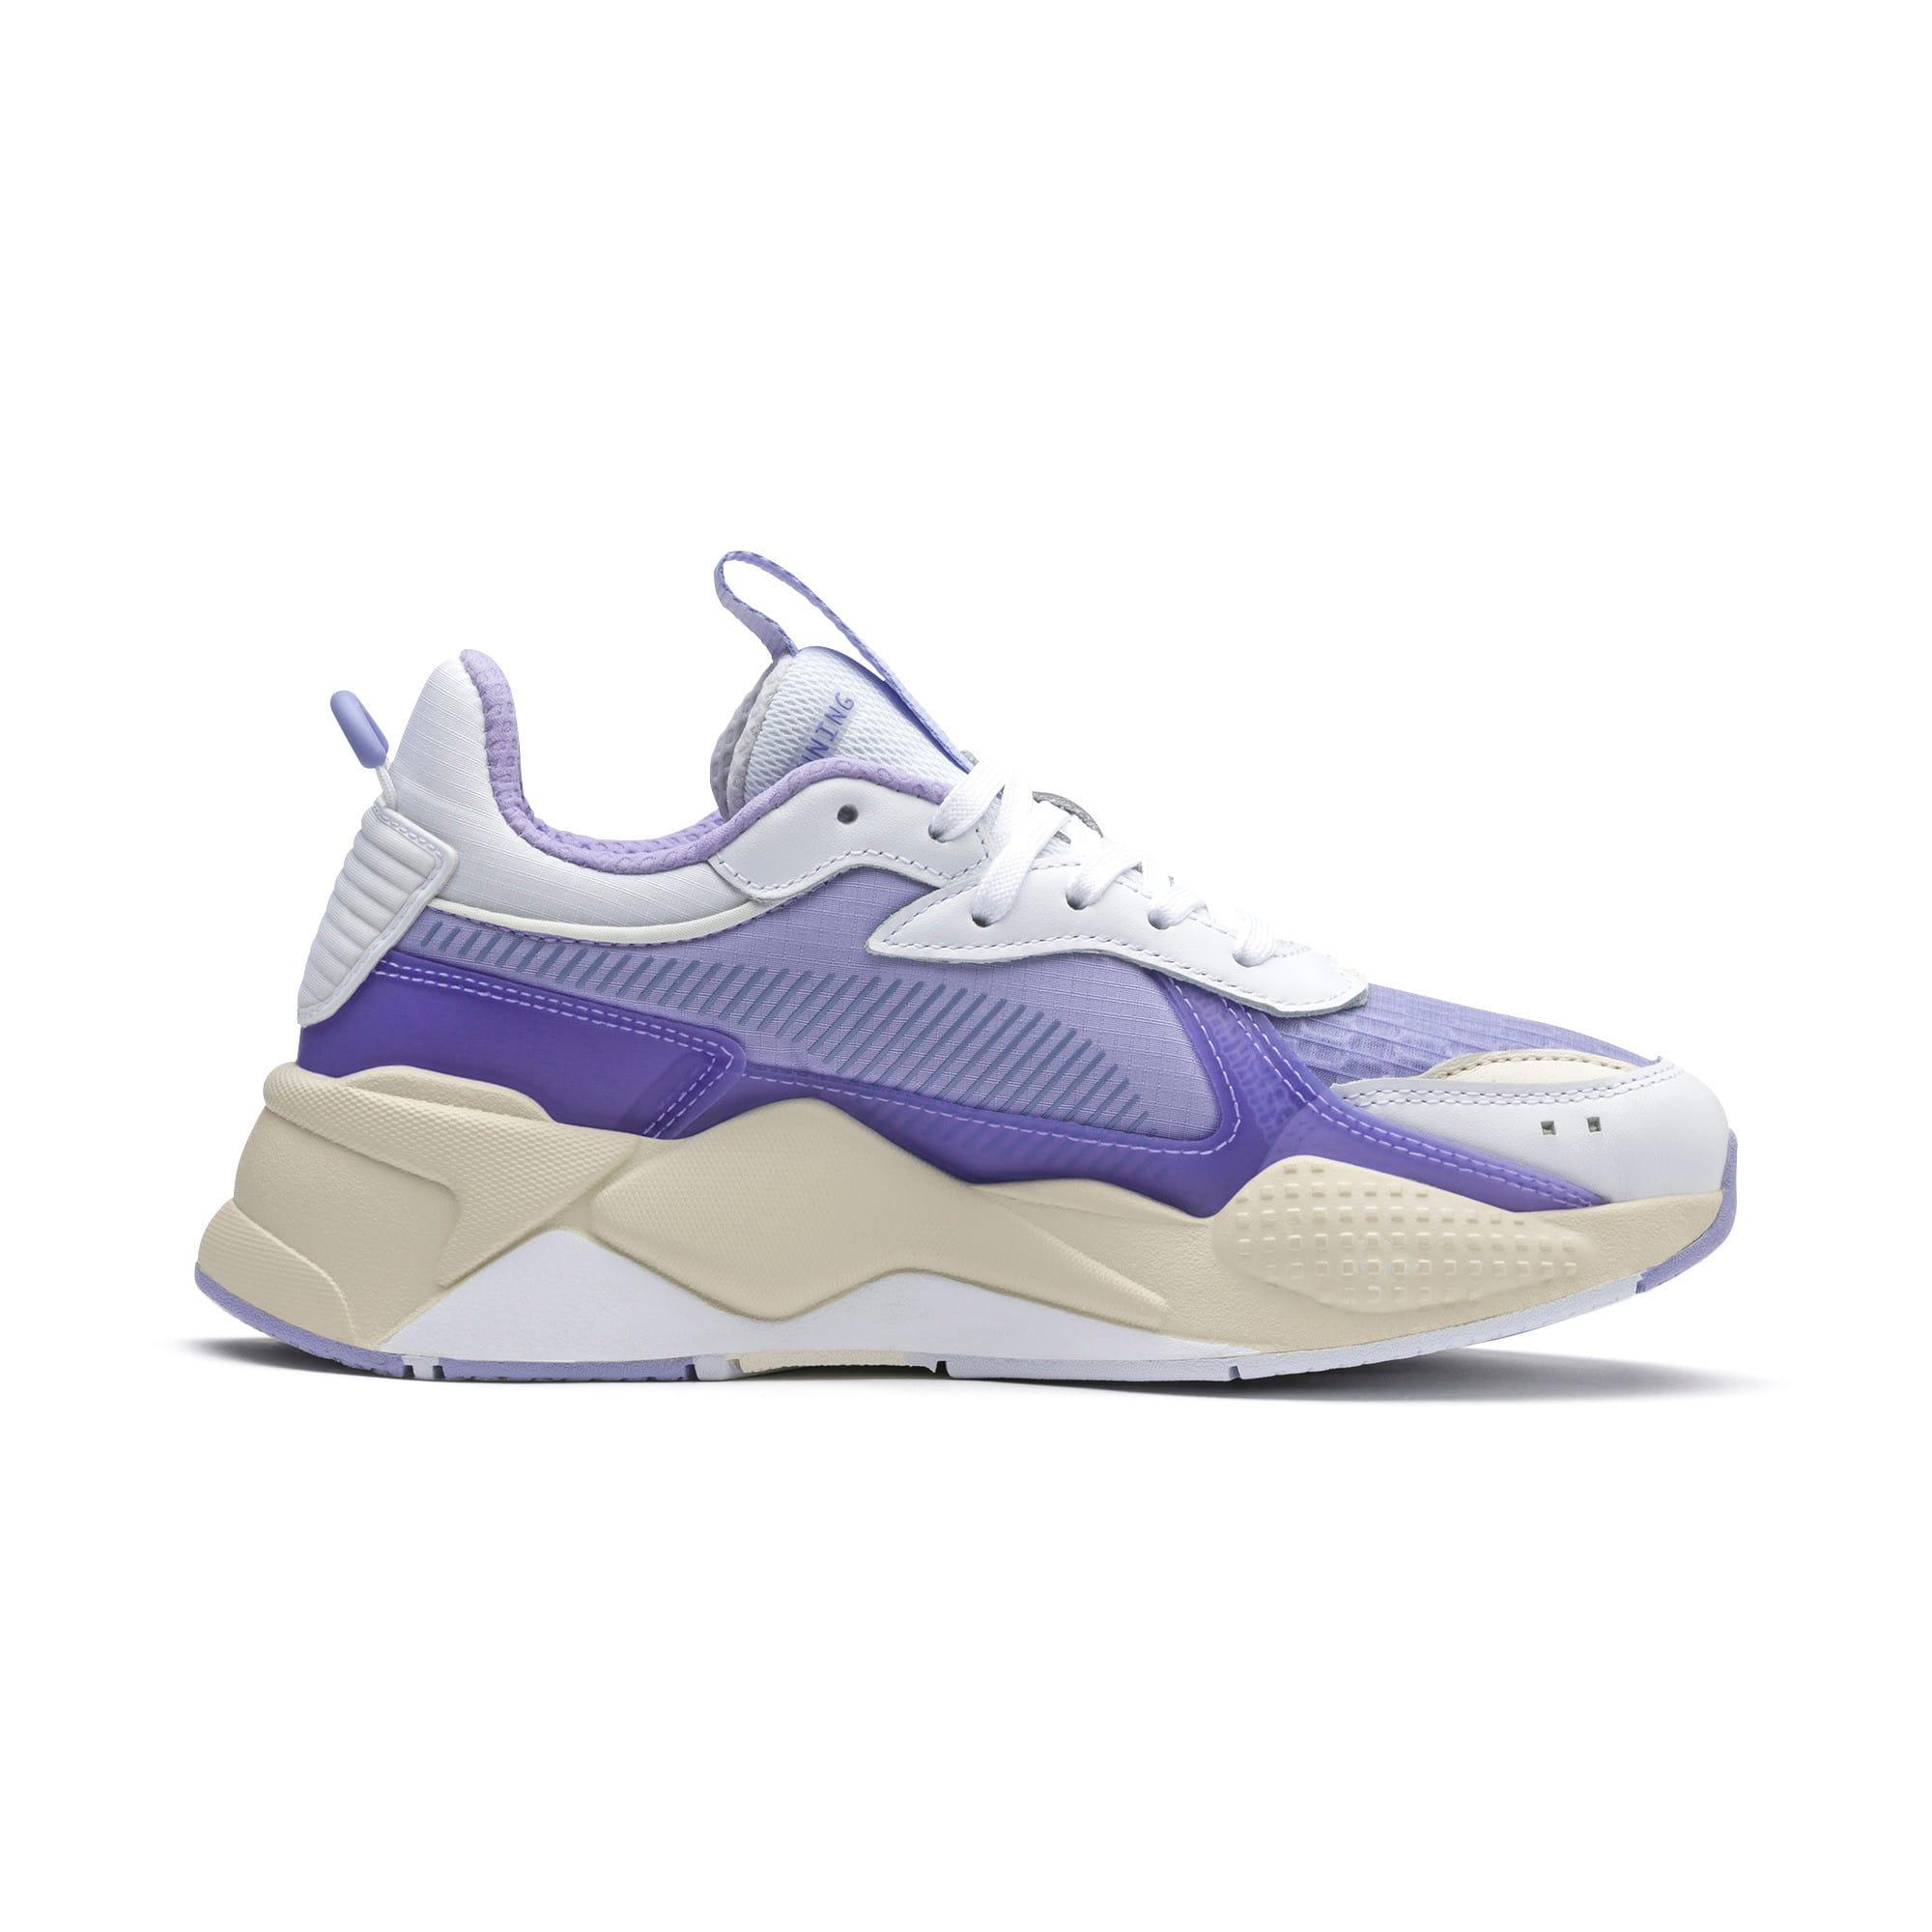 Thumbnail 5 of RS-X Tech Sneaker, Puma White-Sweet Lavender, medium